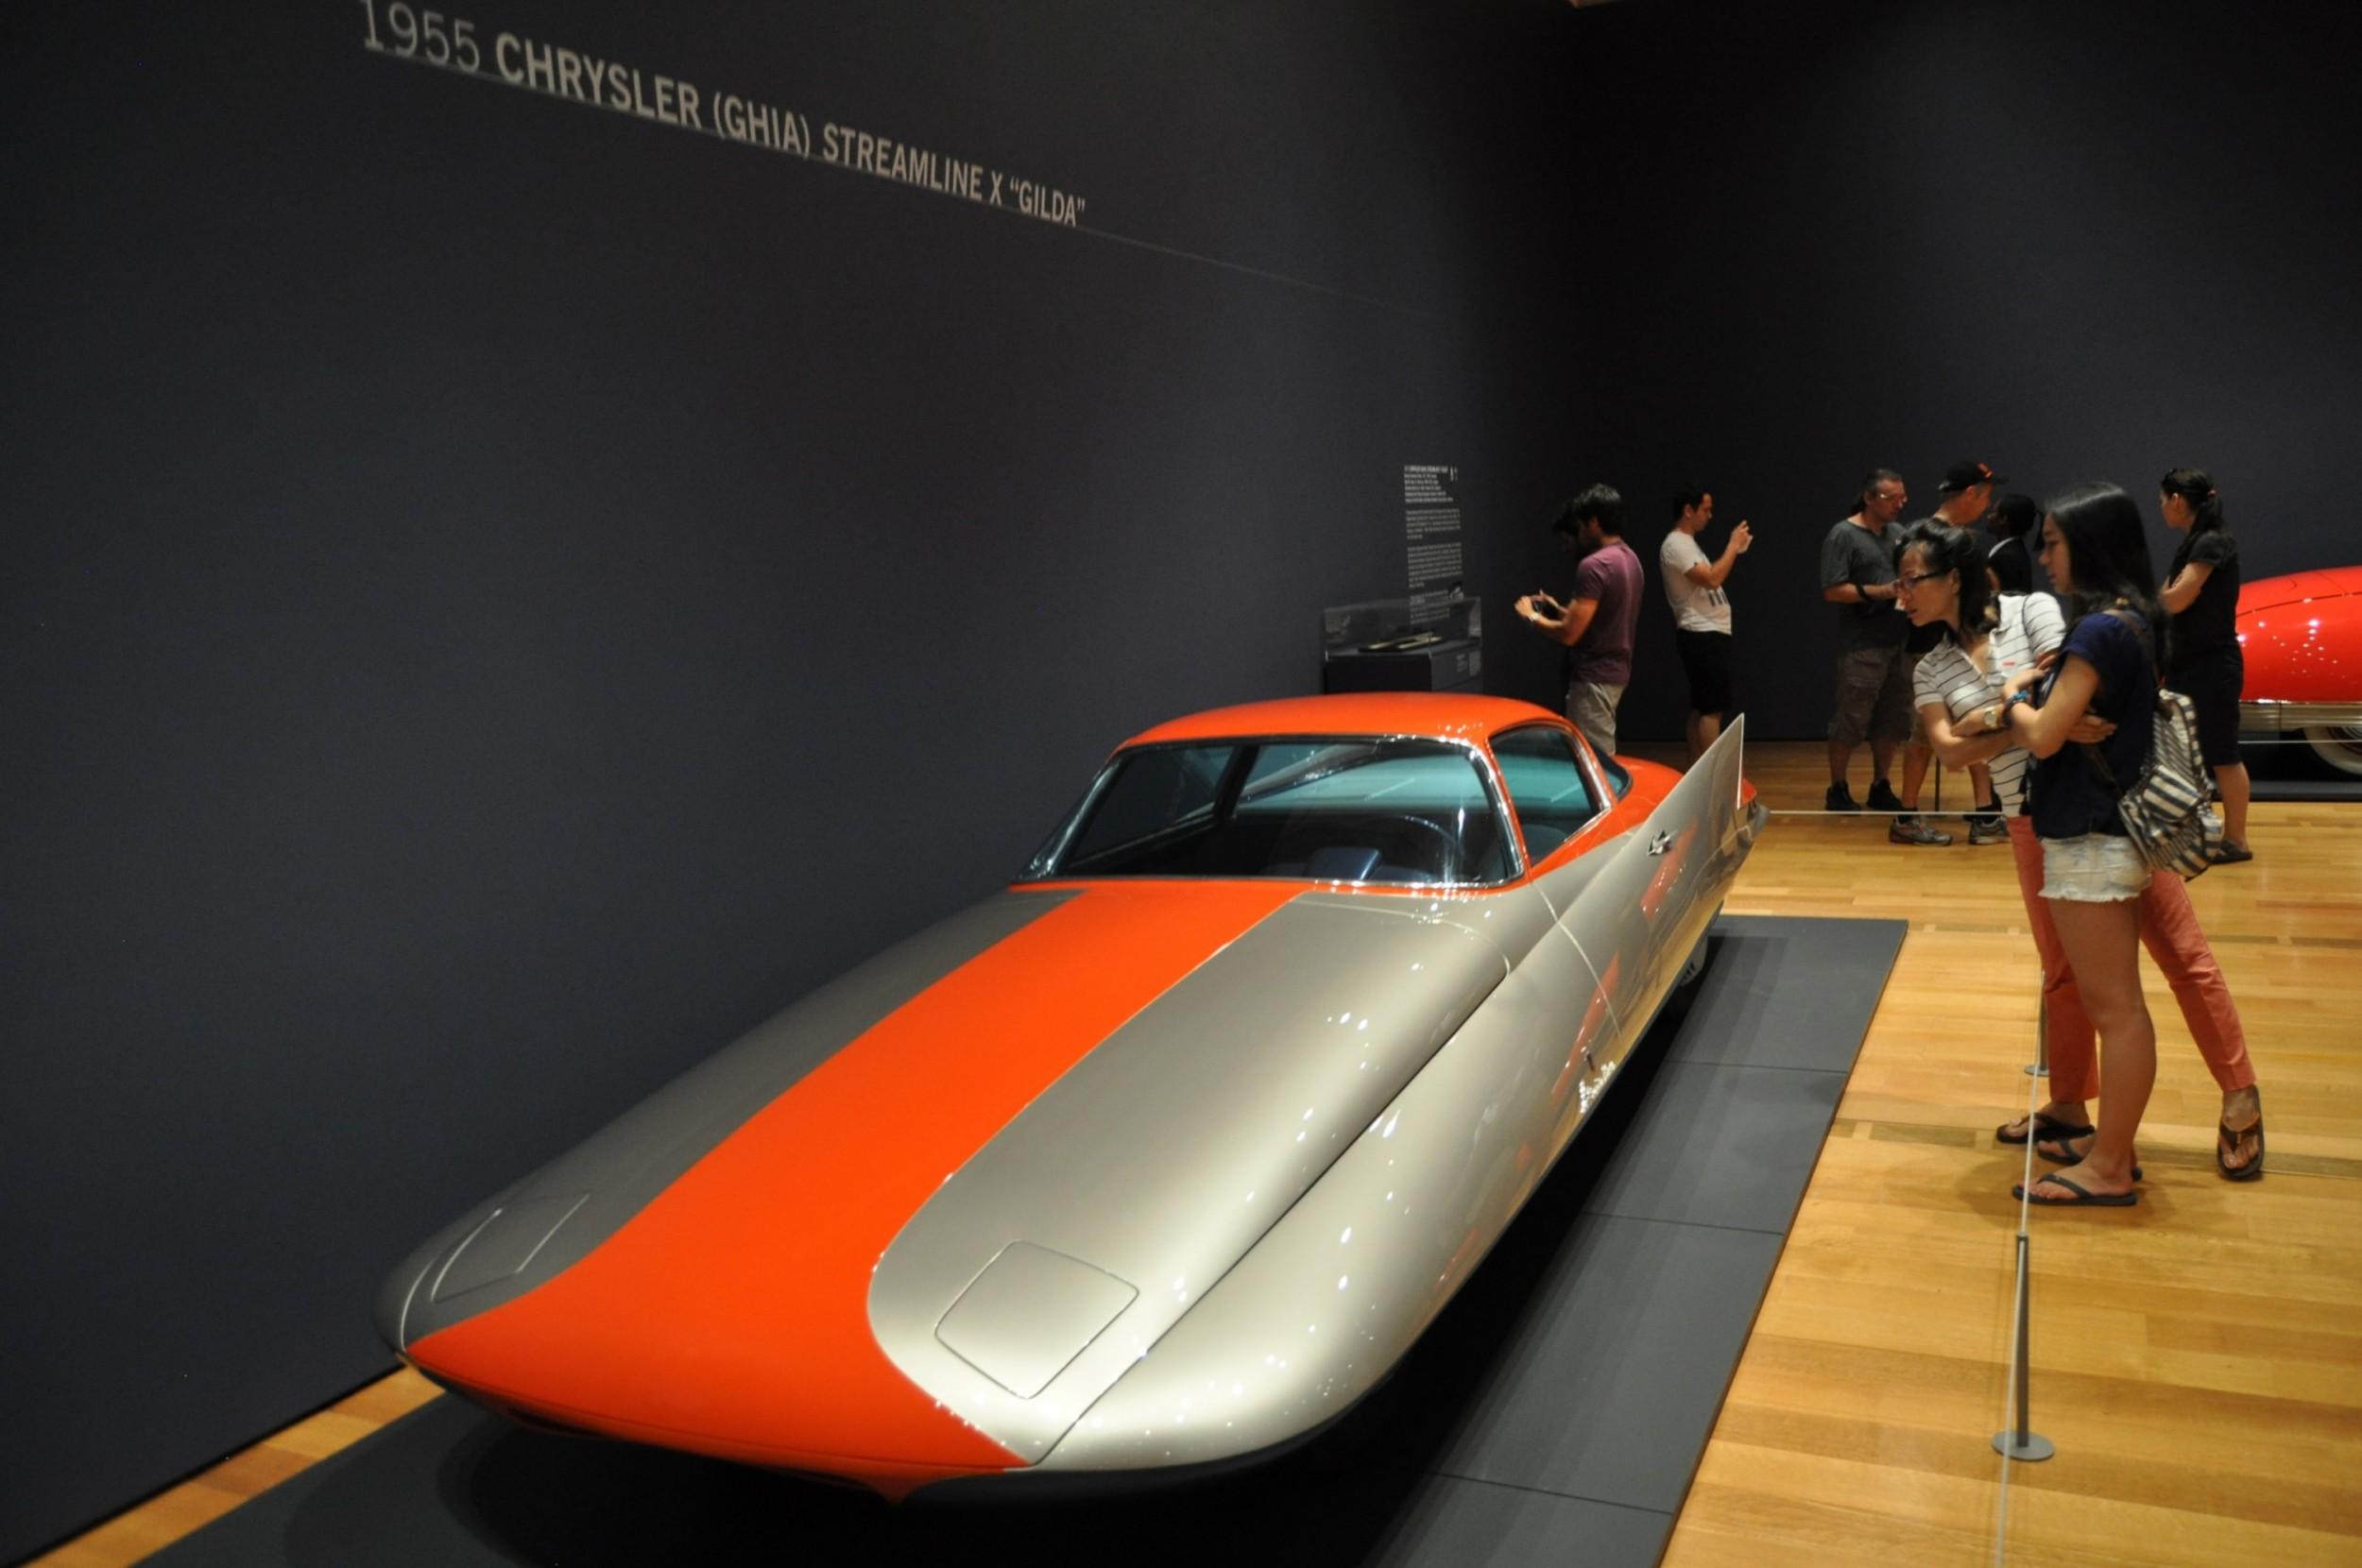 Atlanta Dream Cars Chrysler Streamline X Ghilda By GHIA Is - Ideal classic cars car show